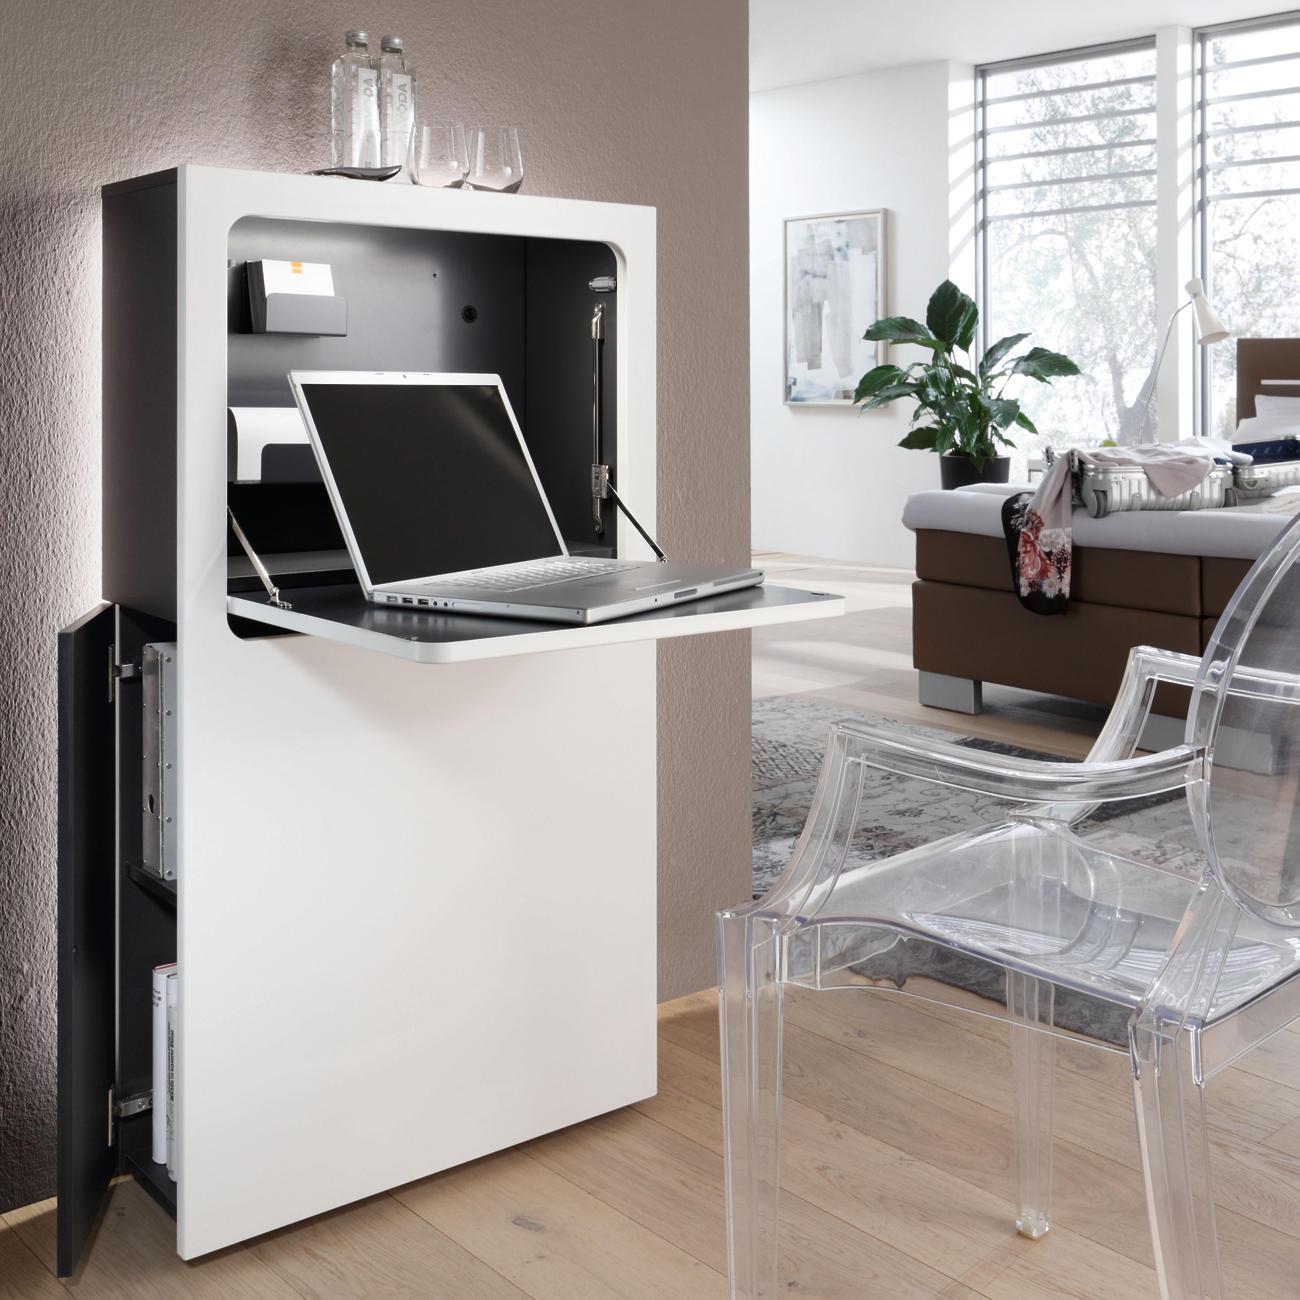 raumwunder sekret r 3 jahre garantie pro idee. Black Bedroom Furniture Sets. Home Design Ideas